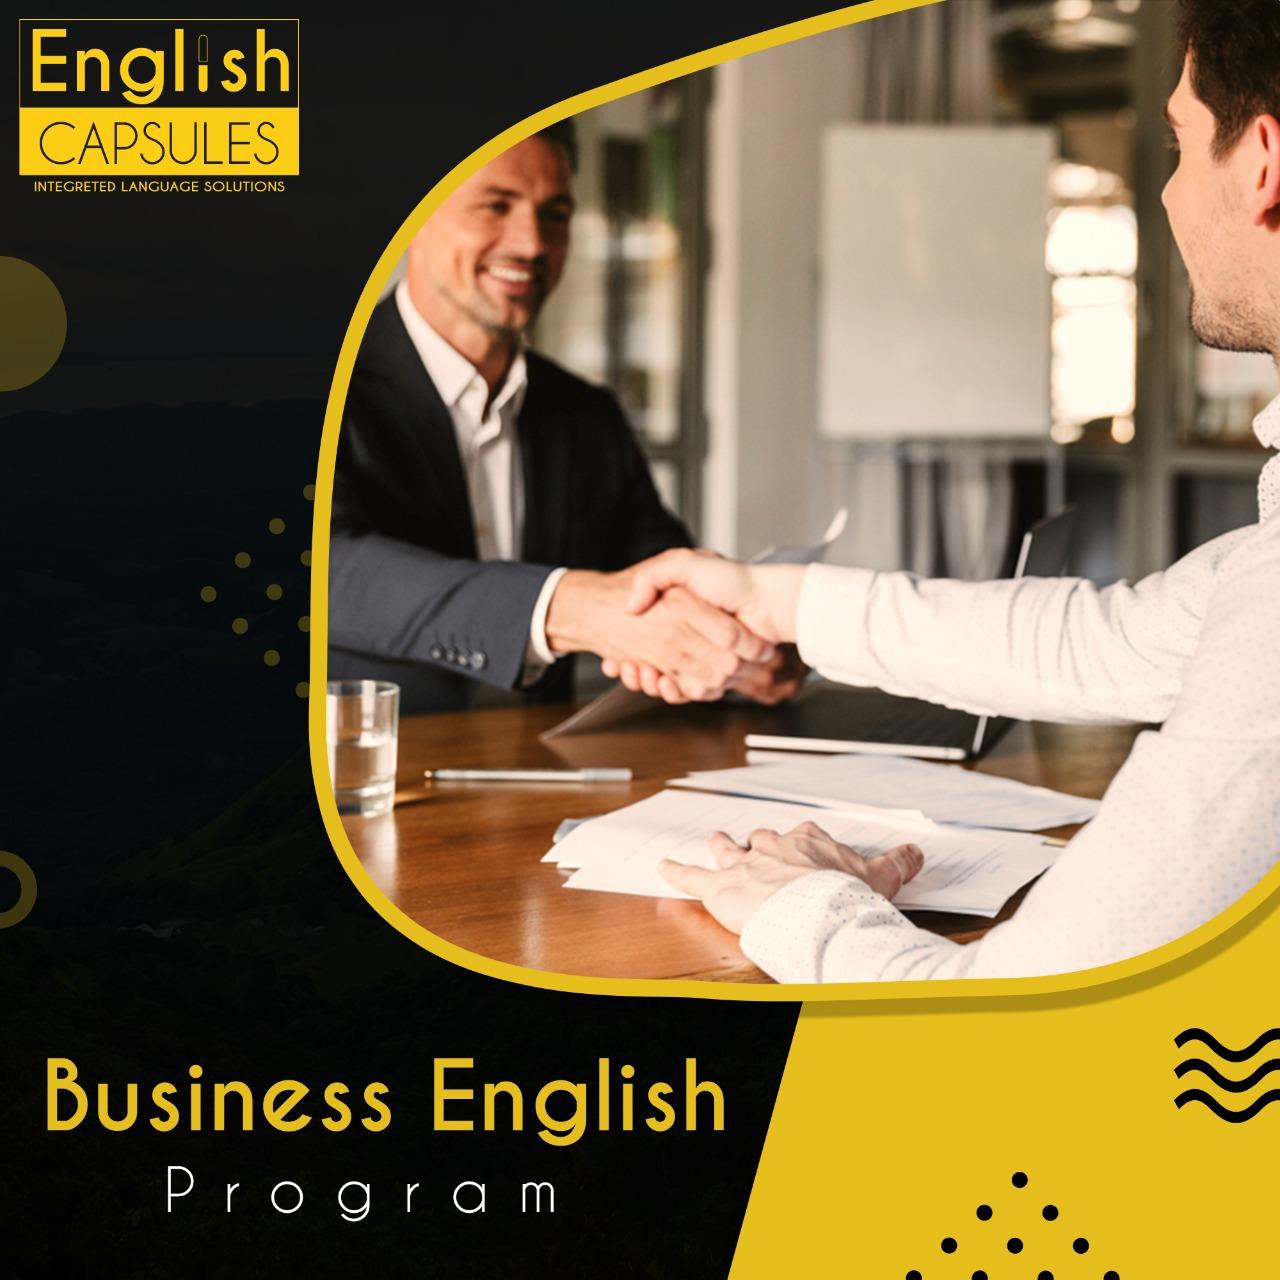 Business English Program